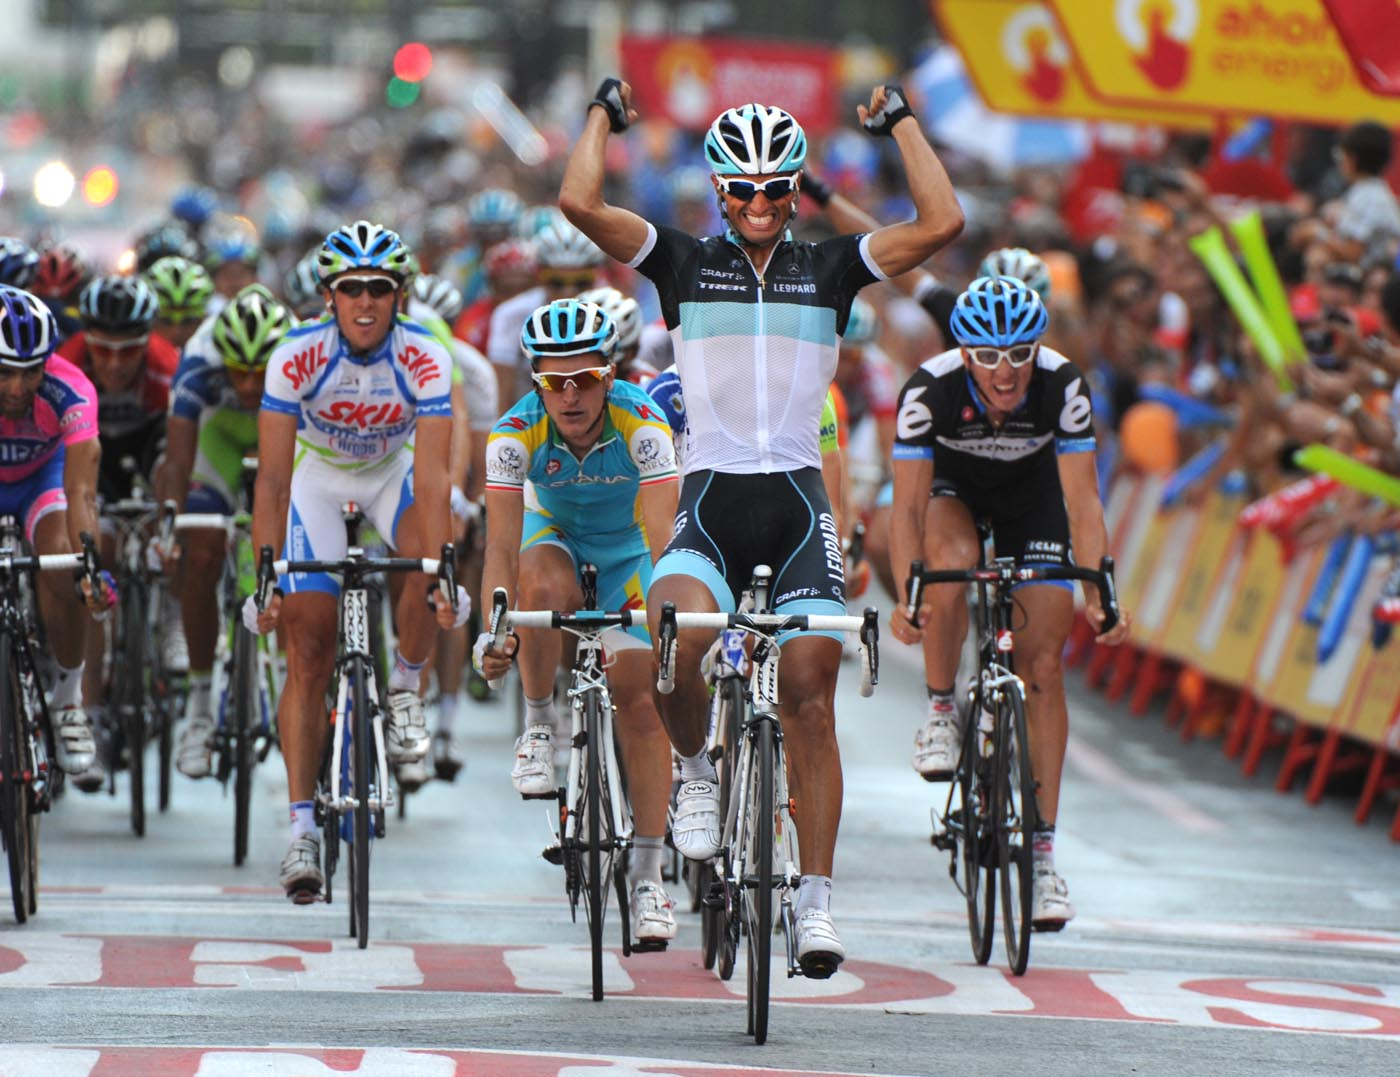 Daniele Bennati wins, Vuelta a Espana 2011, stage 20